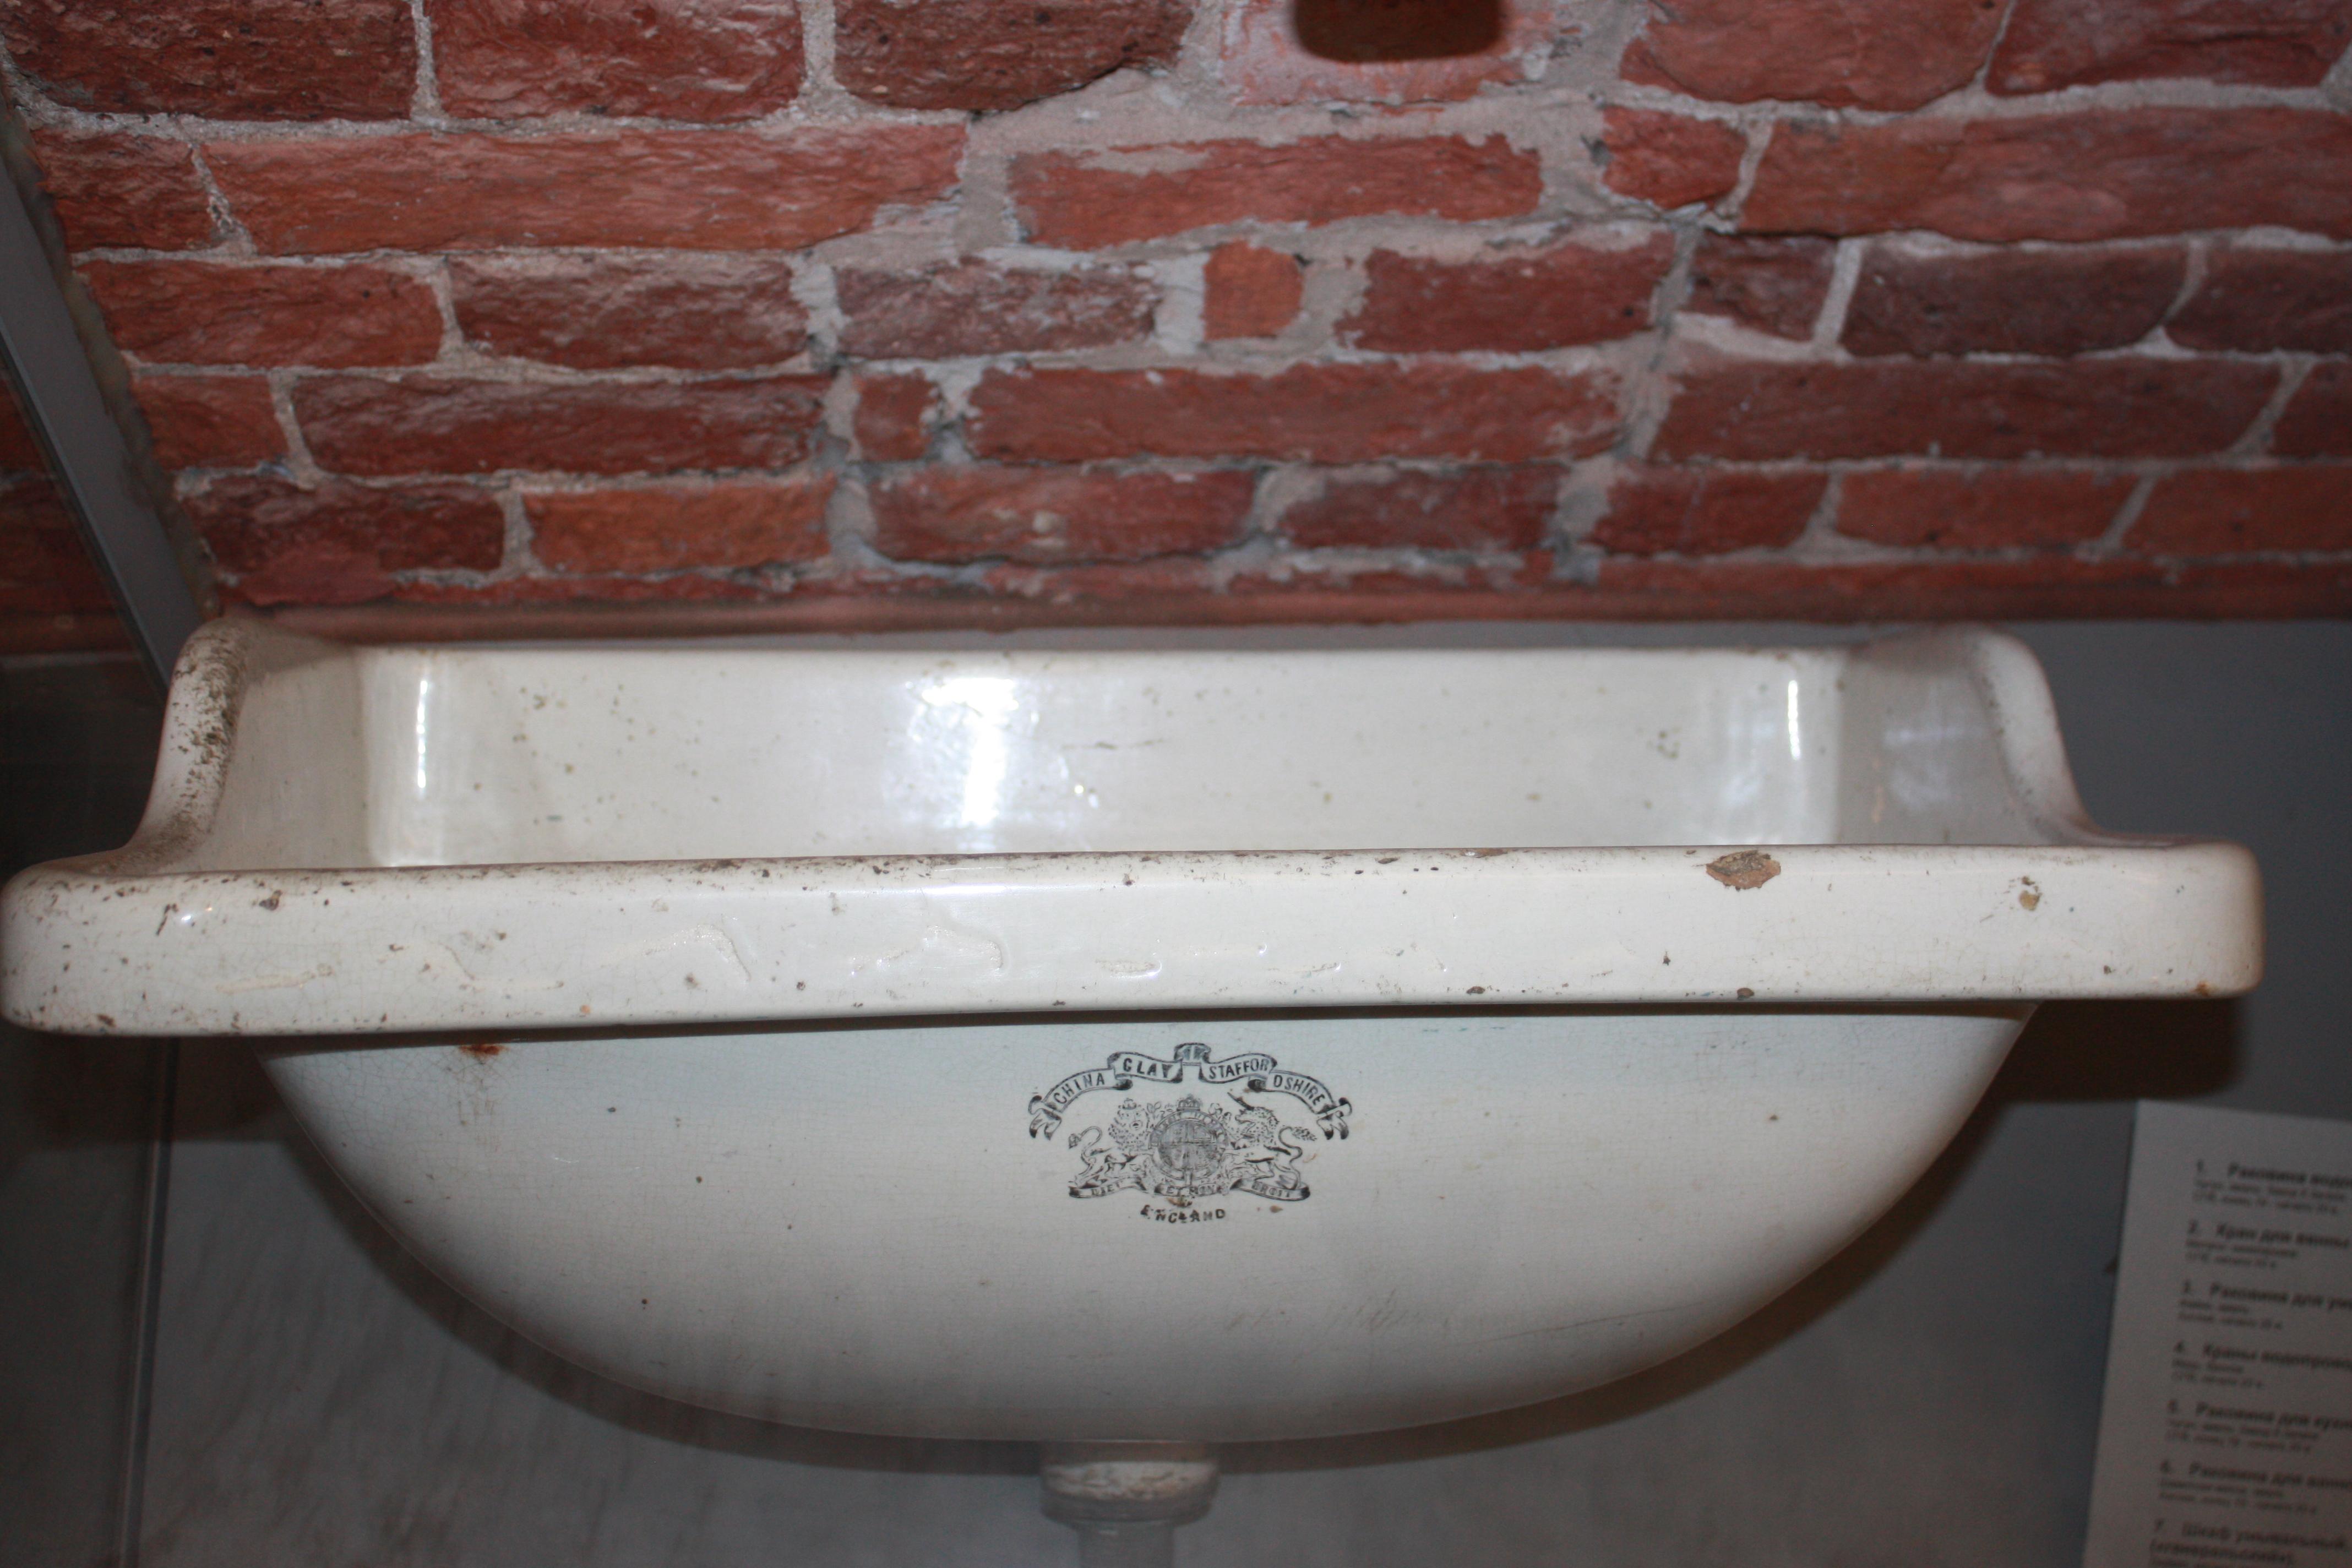 File:Old English Sink.jpg - Wikimedia Commons